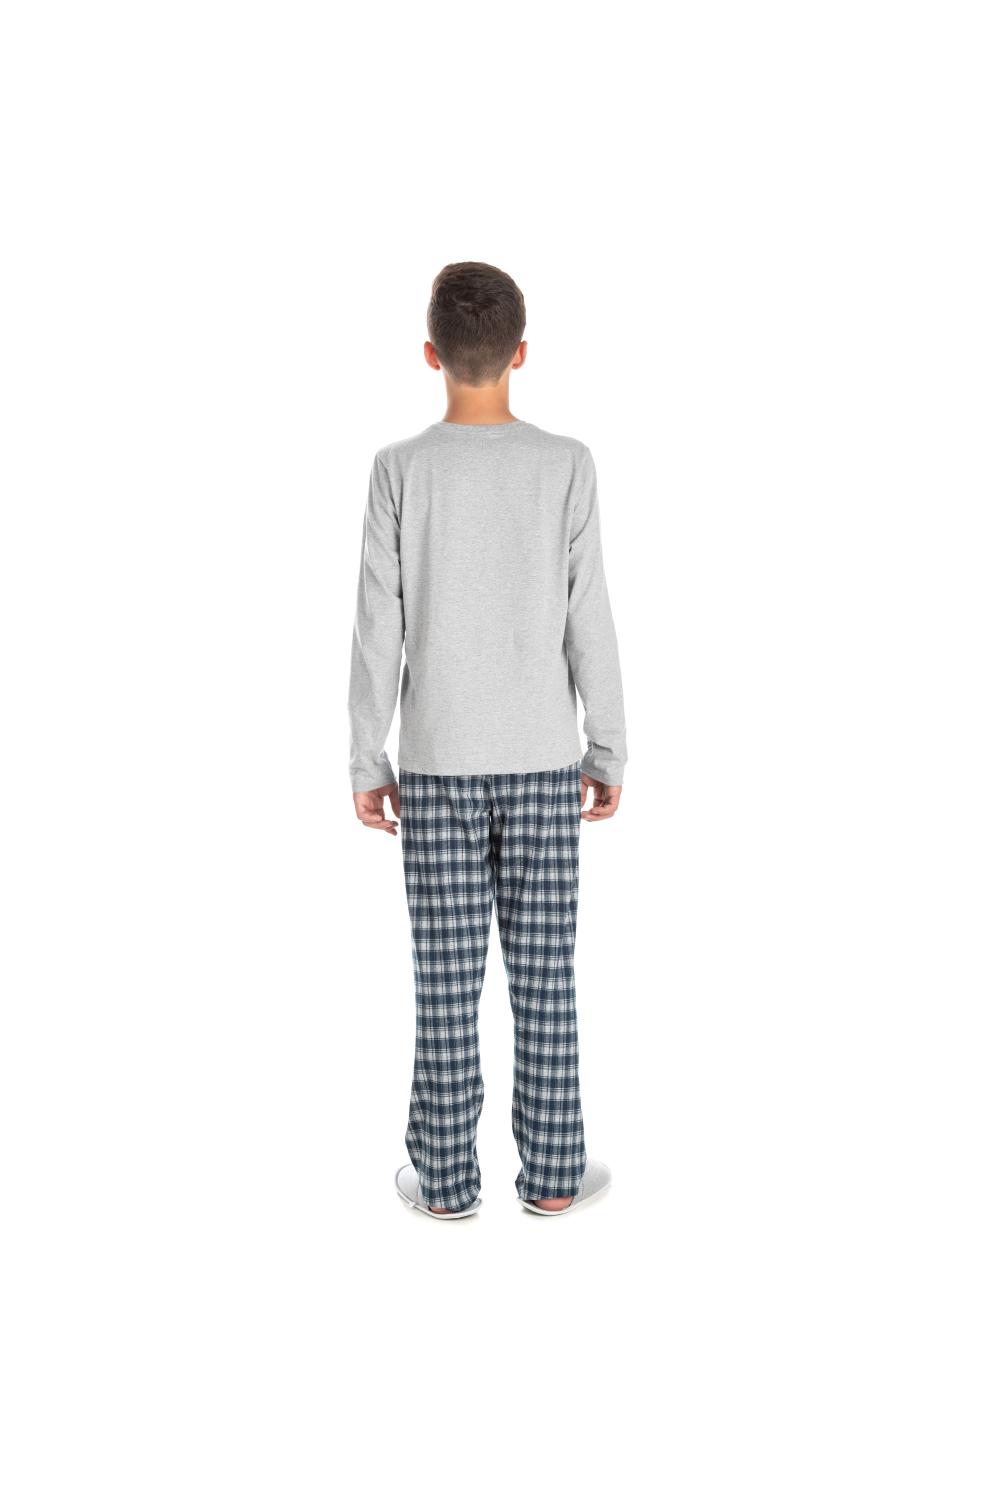 190/E - Pijama Juvenil Masculino Xadrez Família Completa